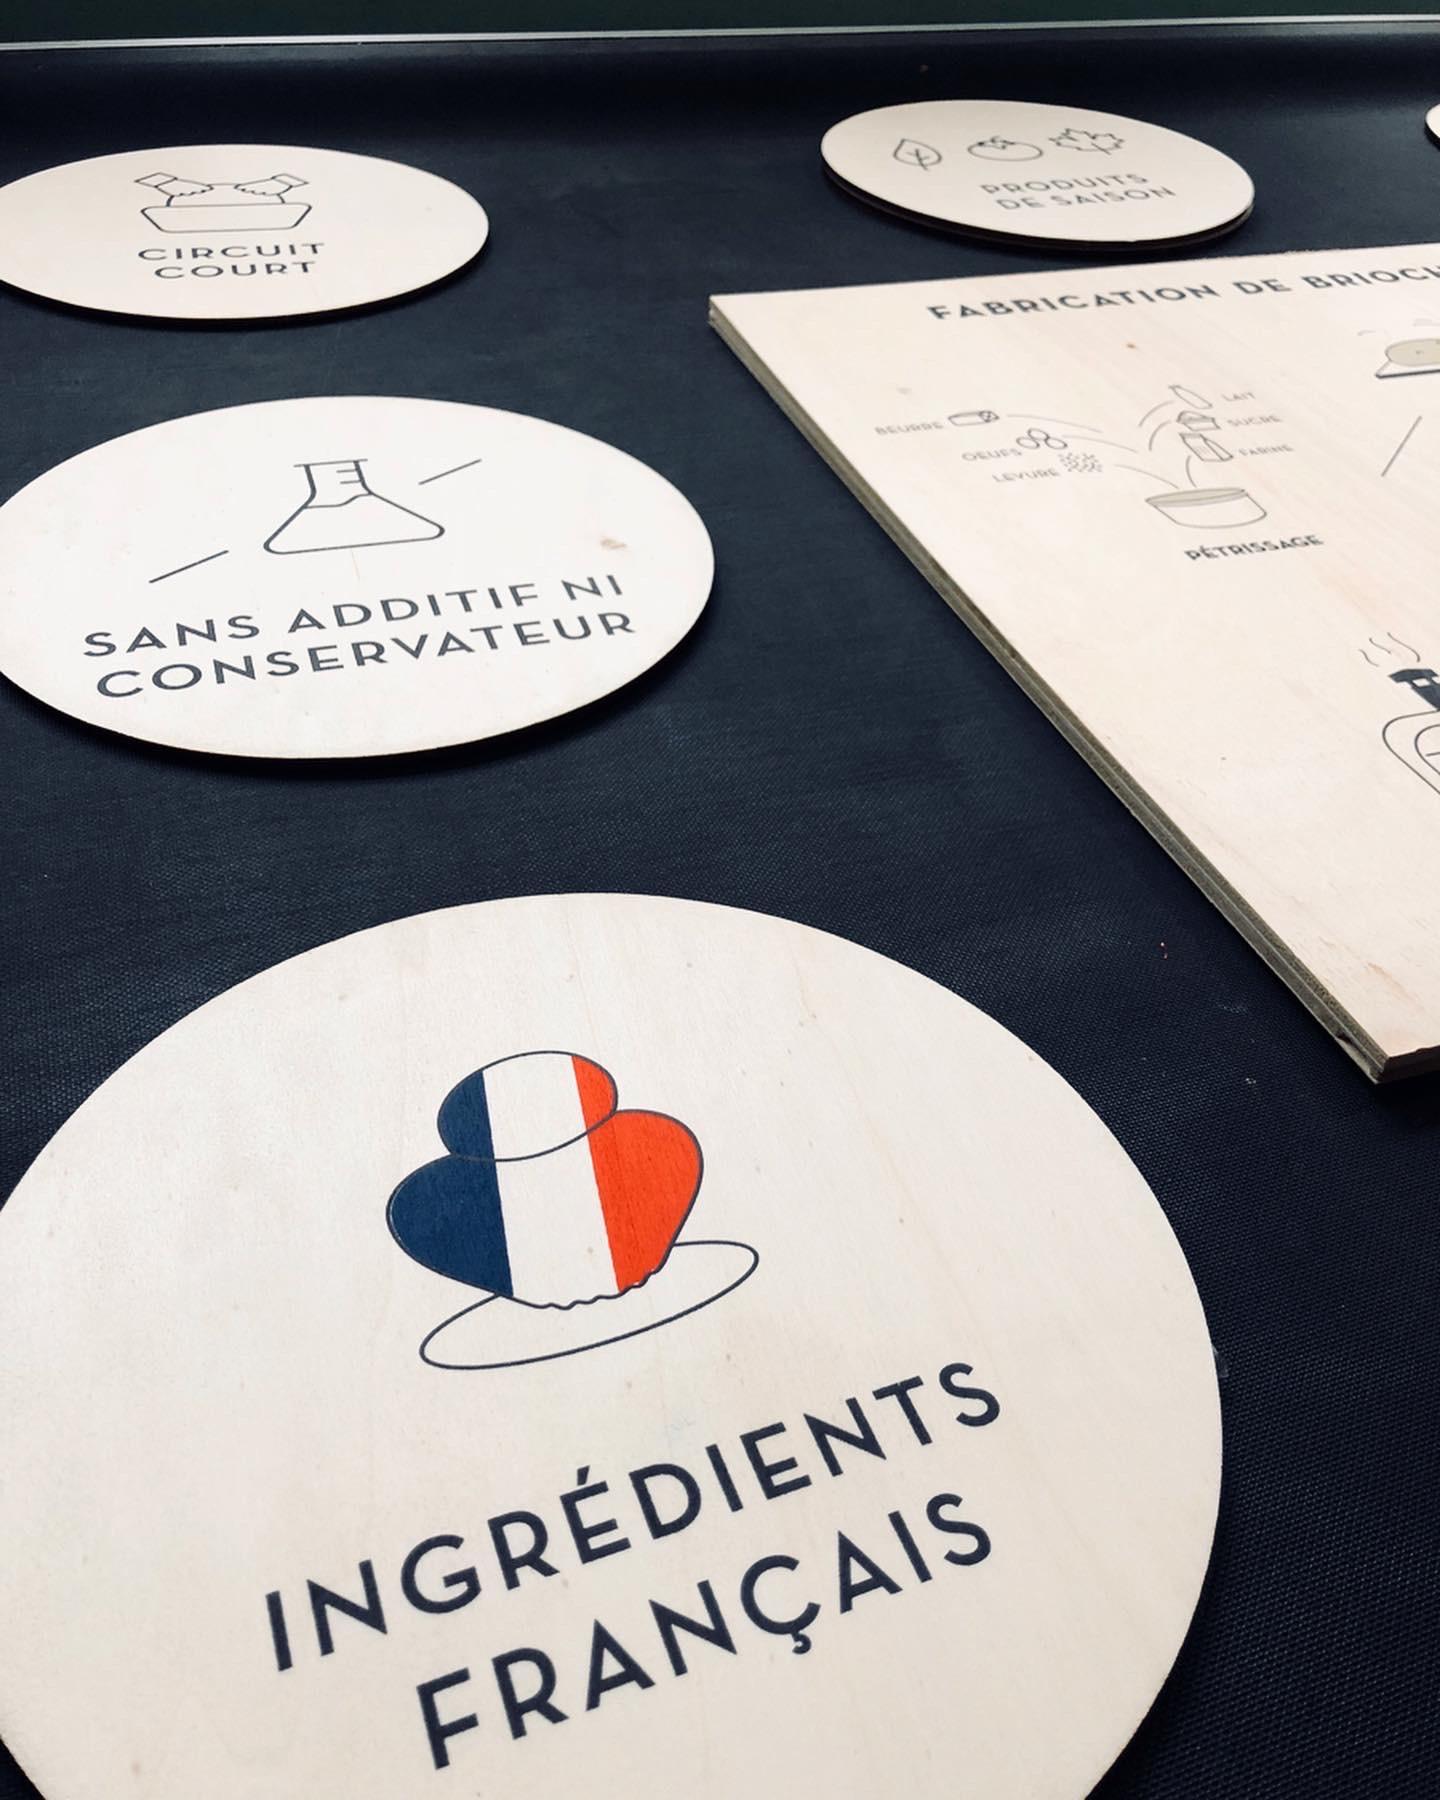 impression-bois-paris-signaletique-serigraphie-atelier-fwells